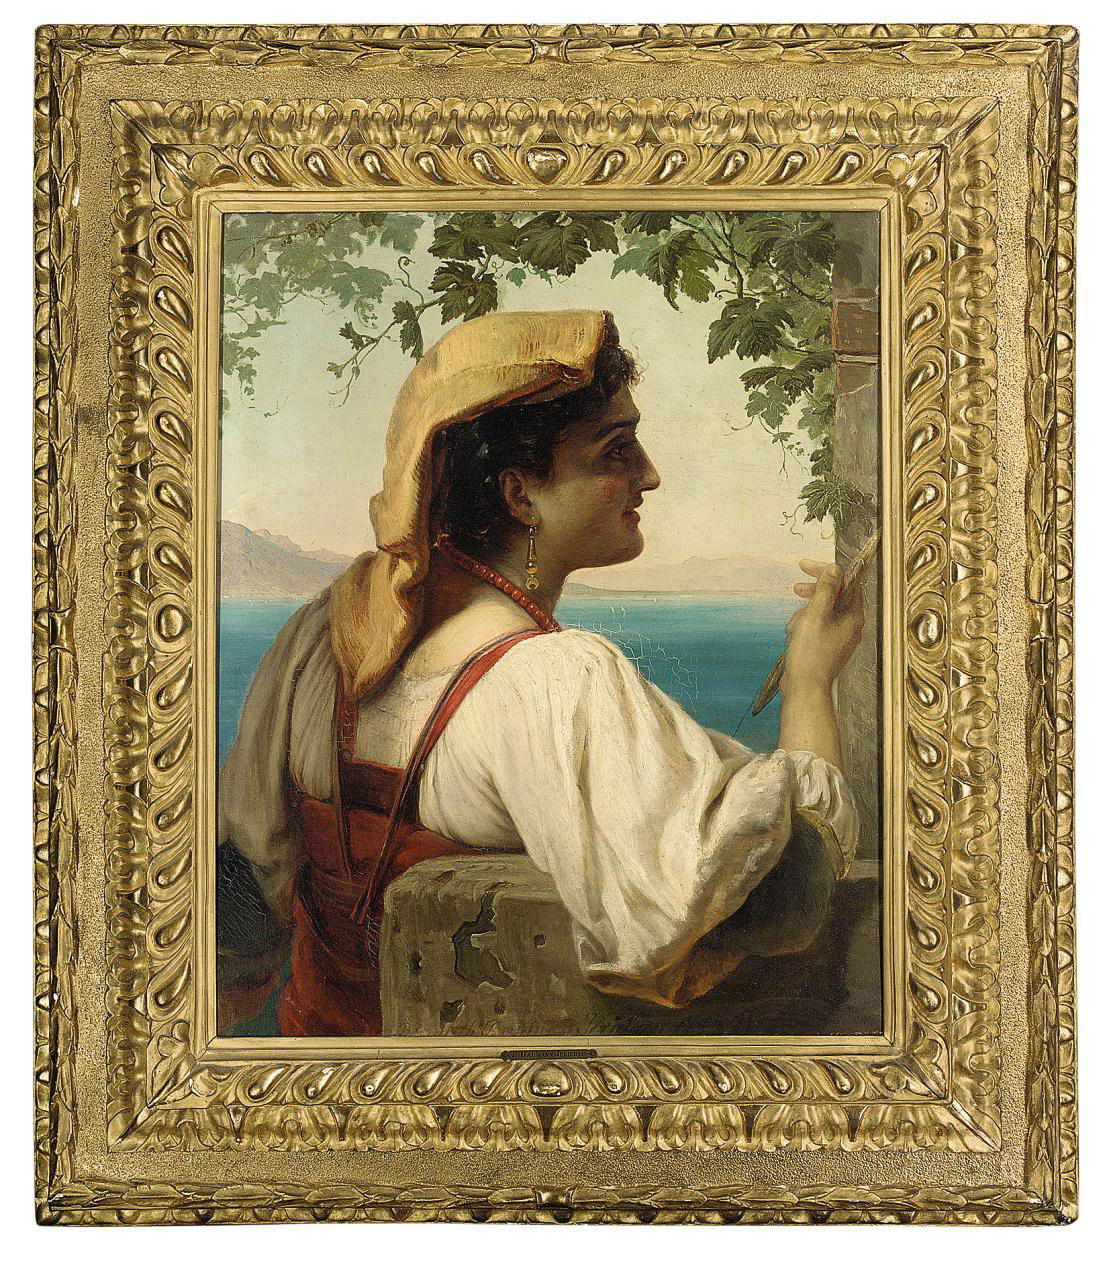 An Italian maiden mending nets on the Bay of Naples, Vesuvius beyond